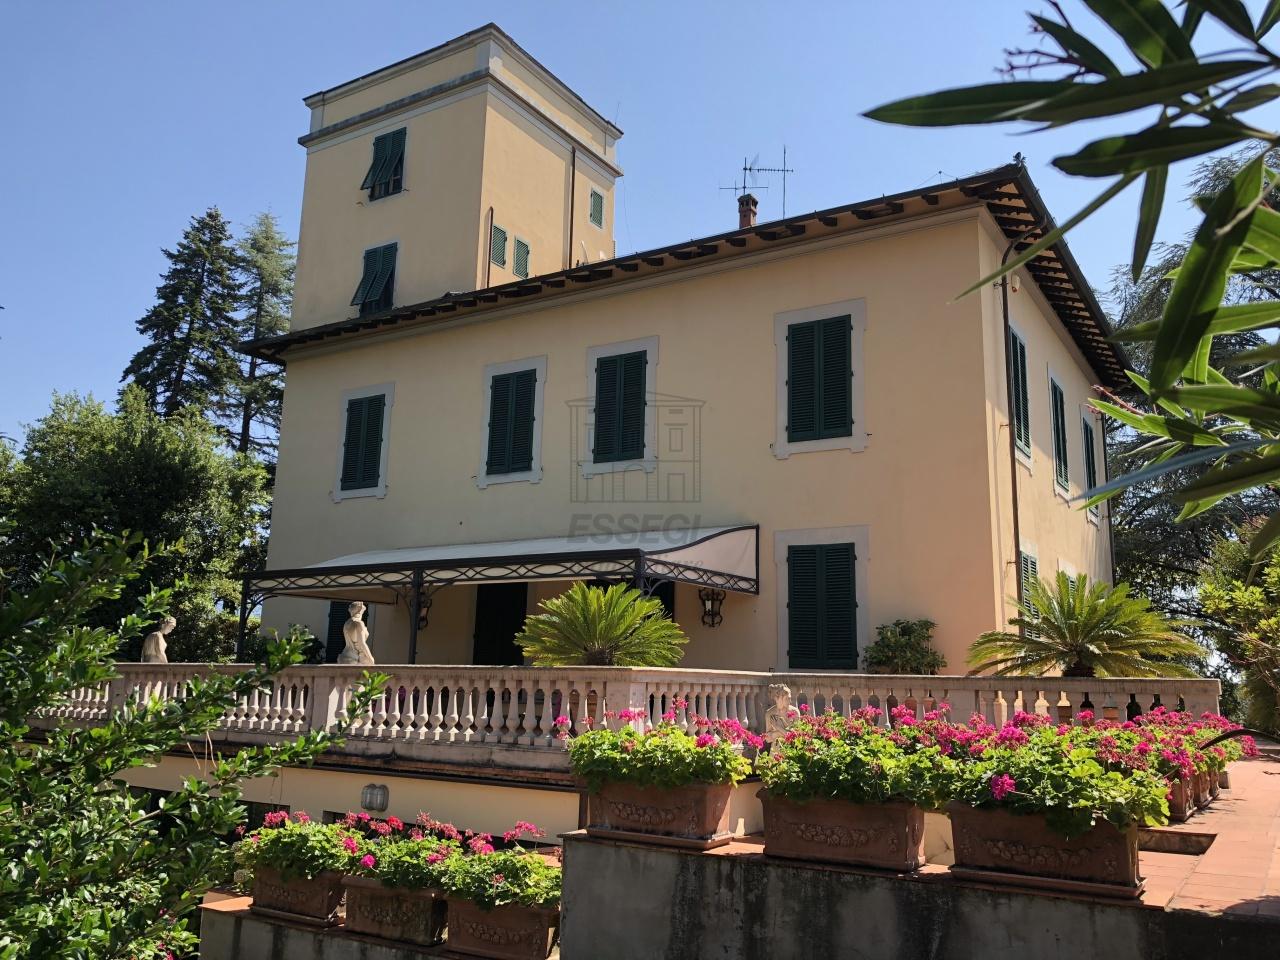 IA02592 Lucca